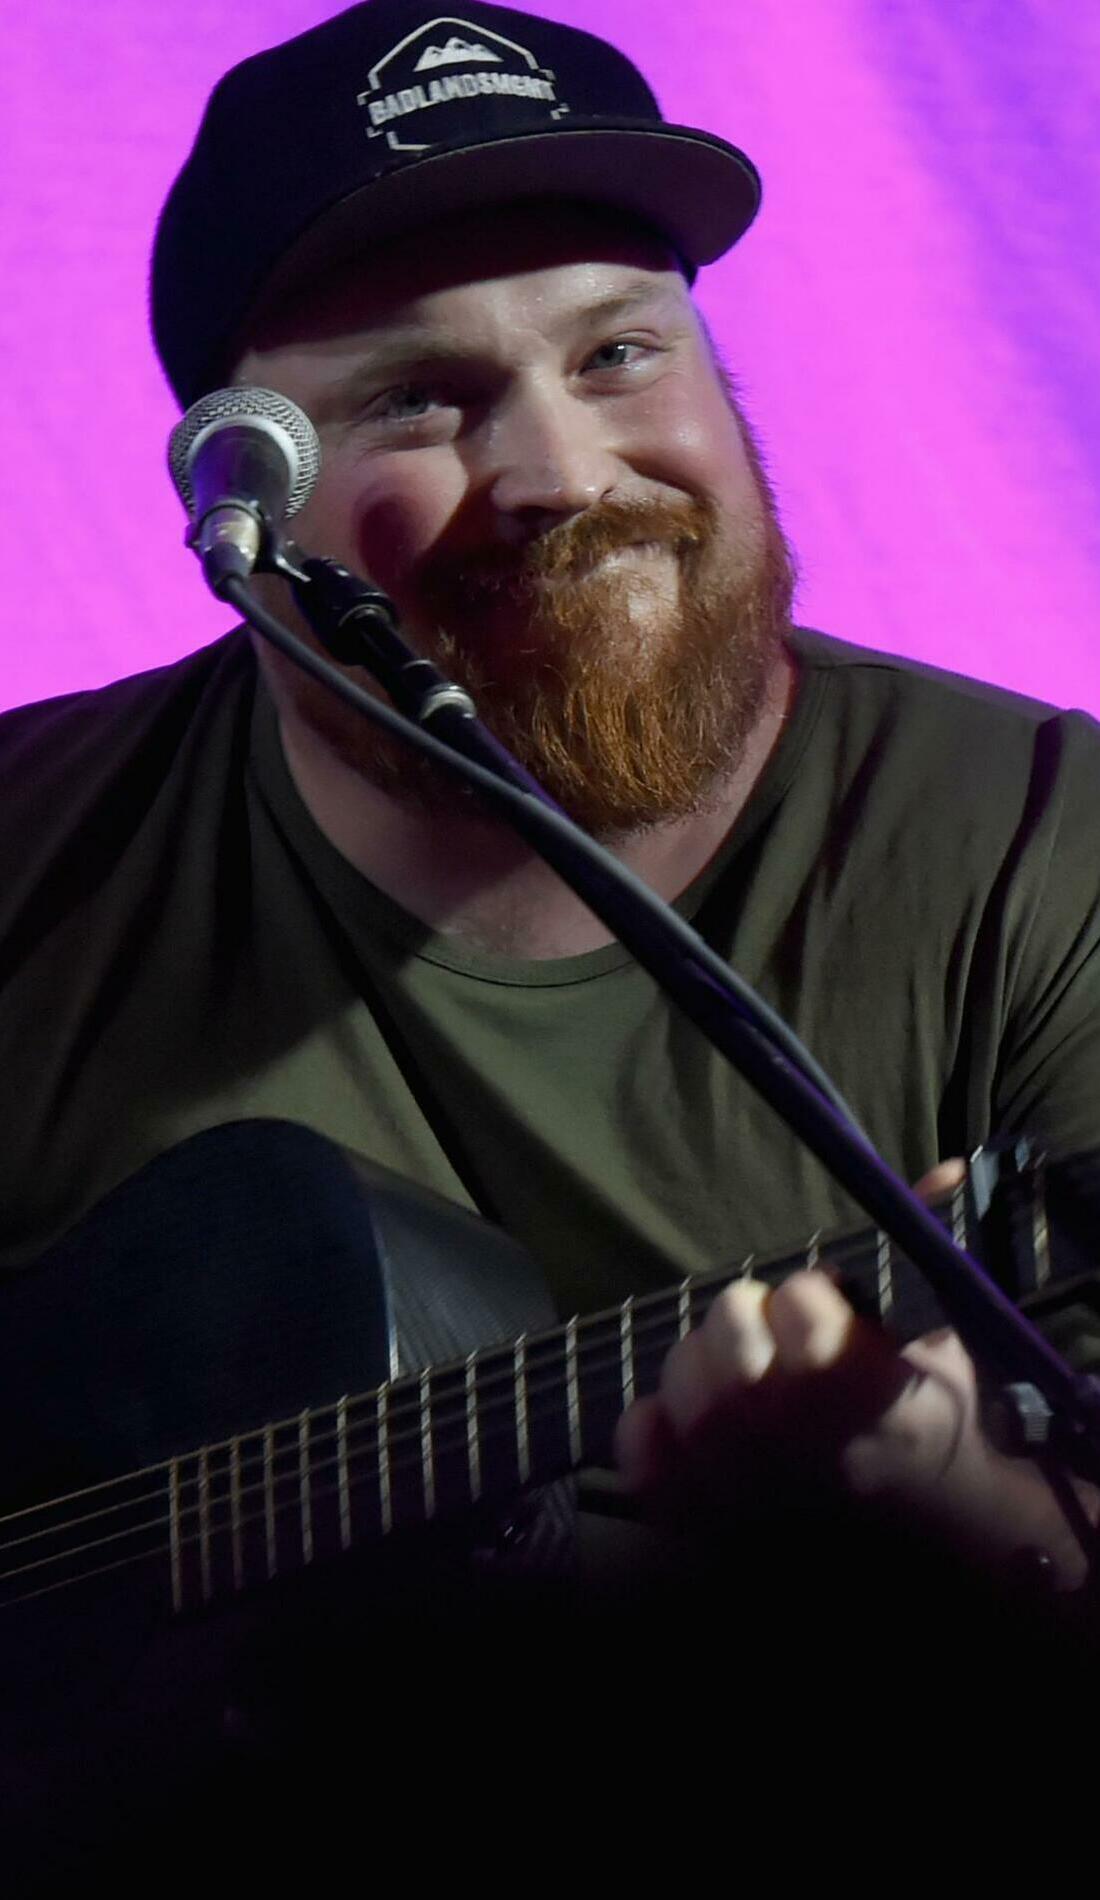 A Austin Jenckes live event